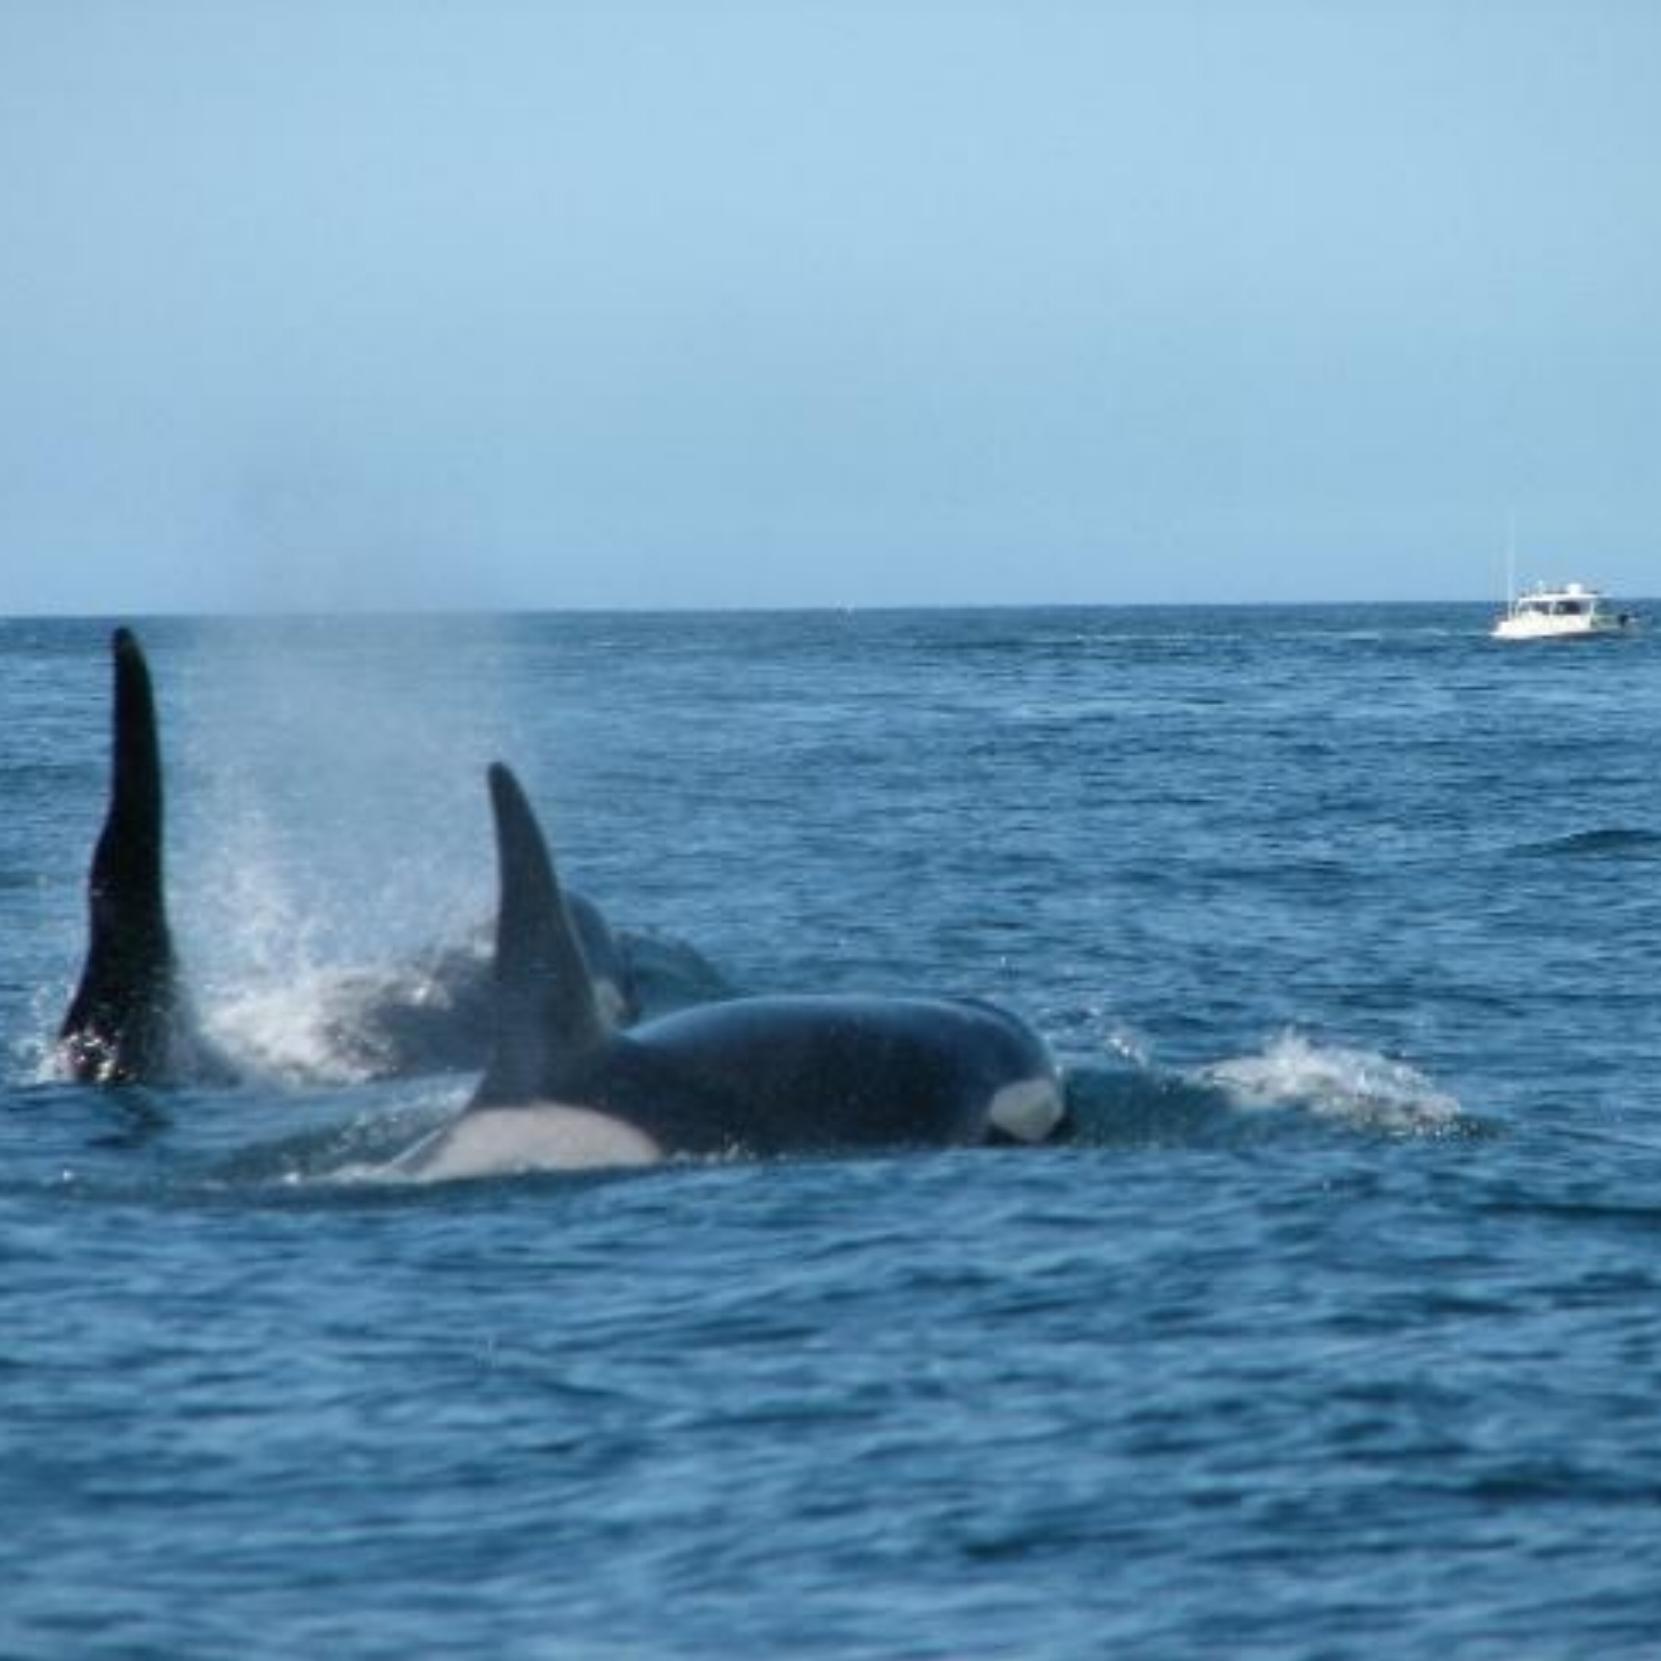 Dobbyn, Bev - Killer whales x 2.JPG